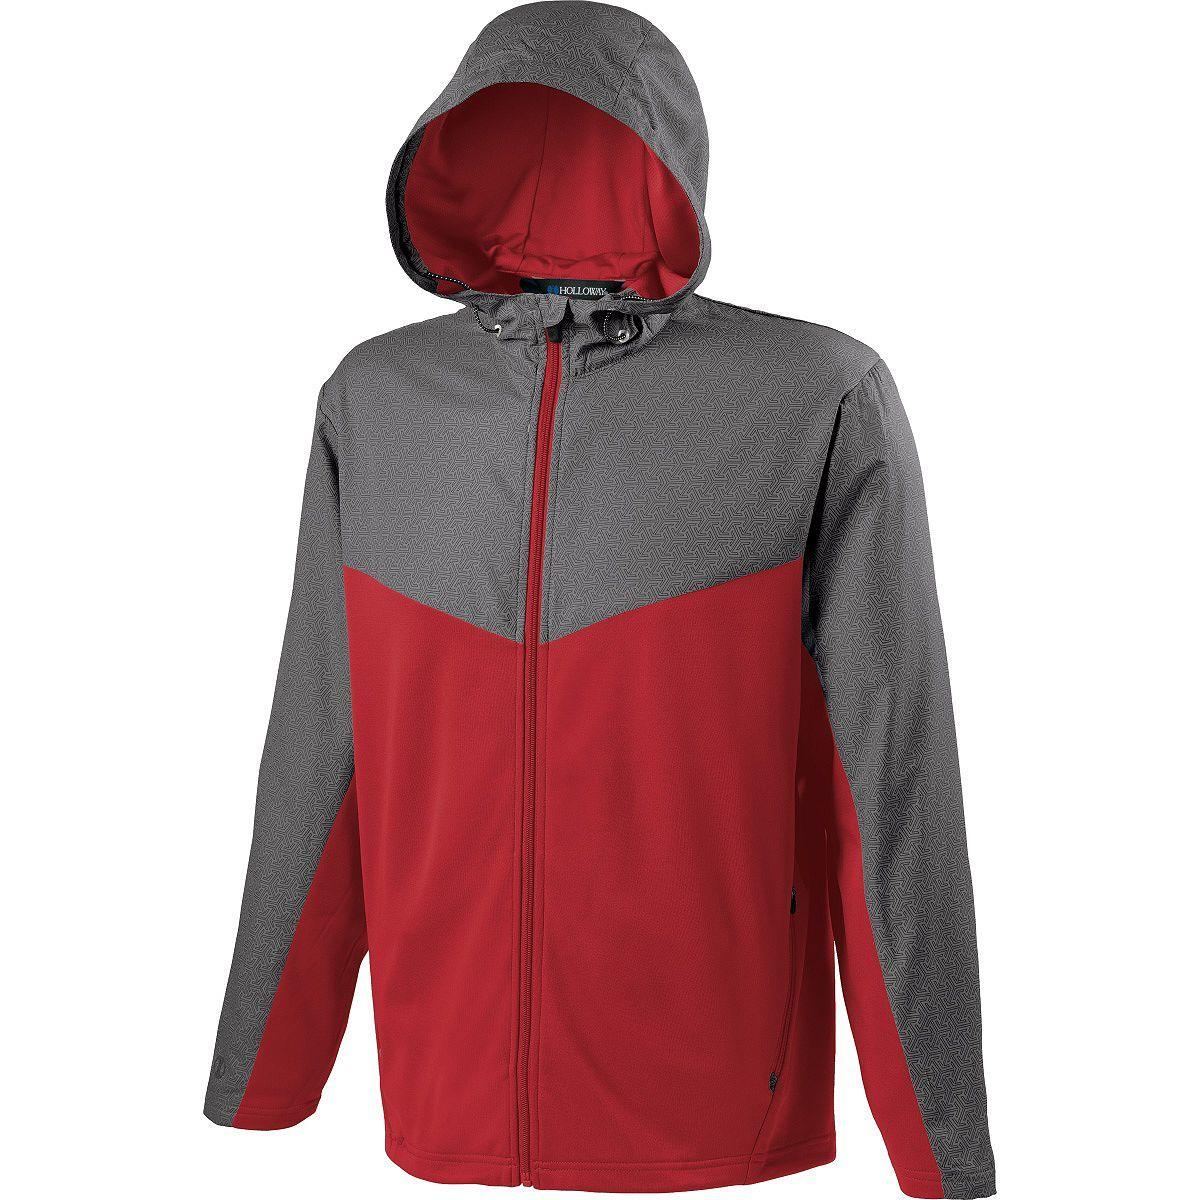 Adult Crossover Jacket - GREY PRINT/SCARLET